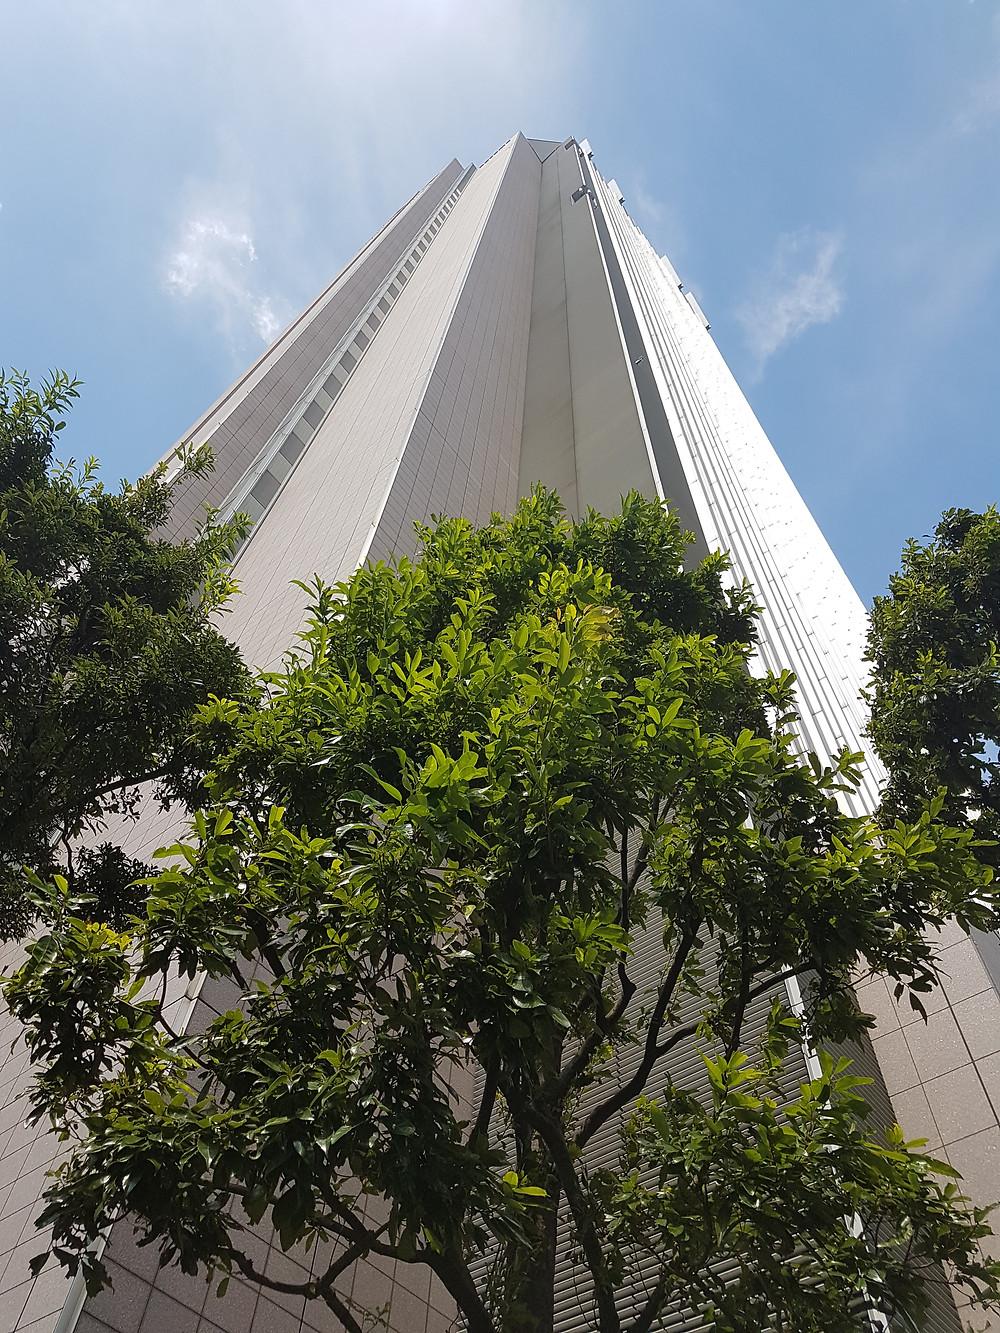 Tall building in Hong Kong